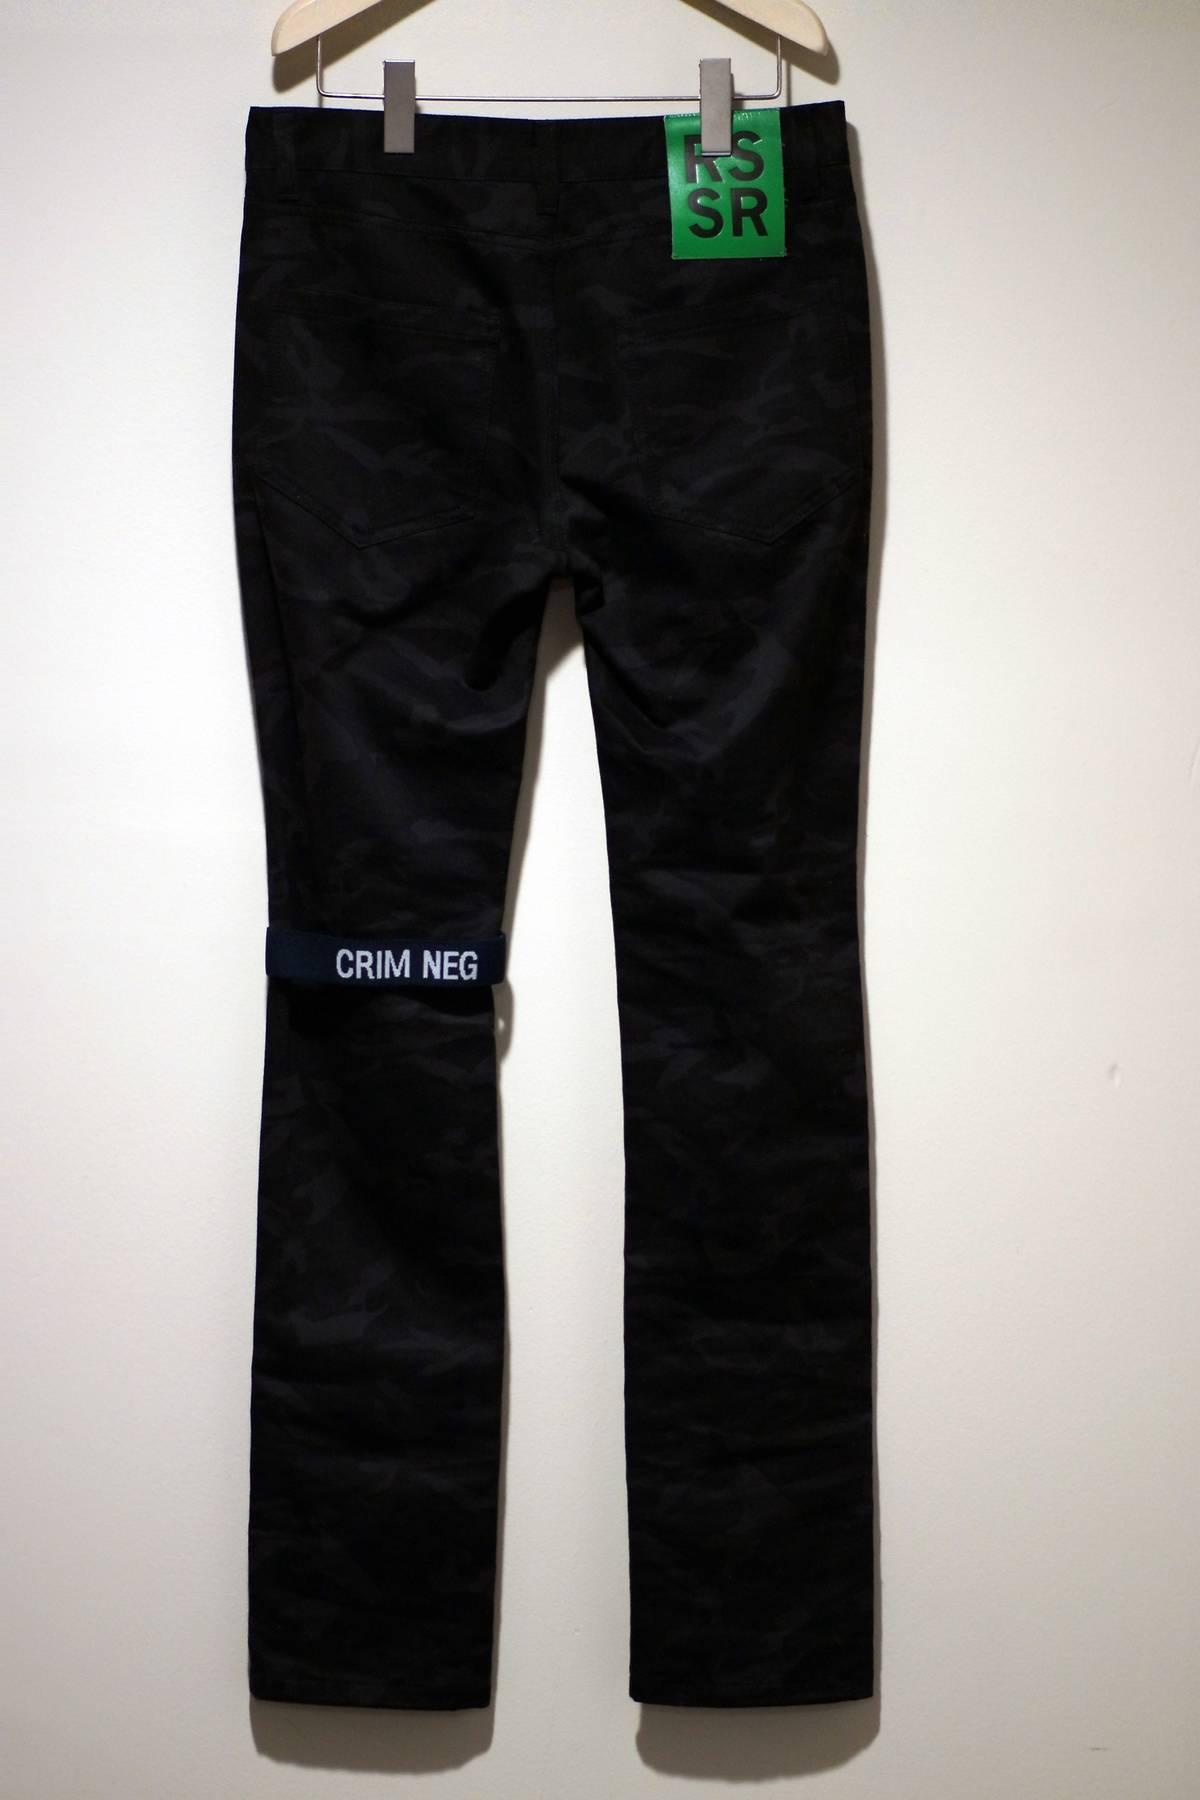 raf simons 39 crim neg 39 skinny jeans size 30 denim for